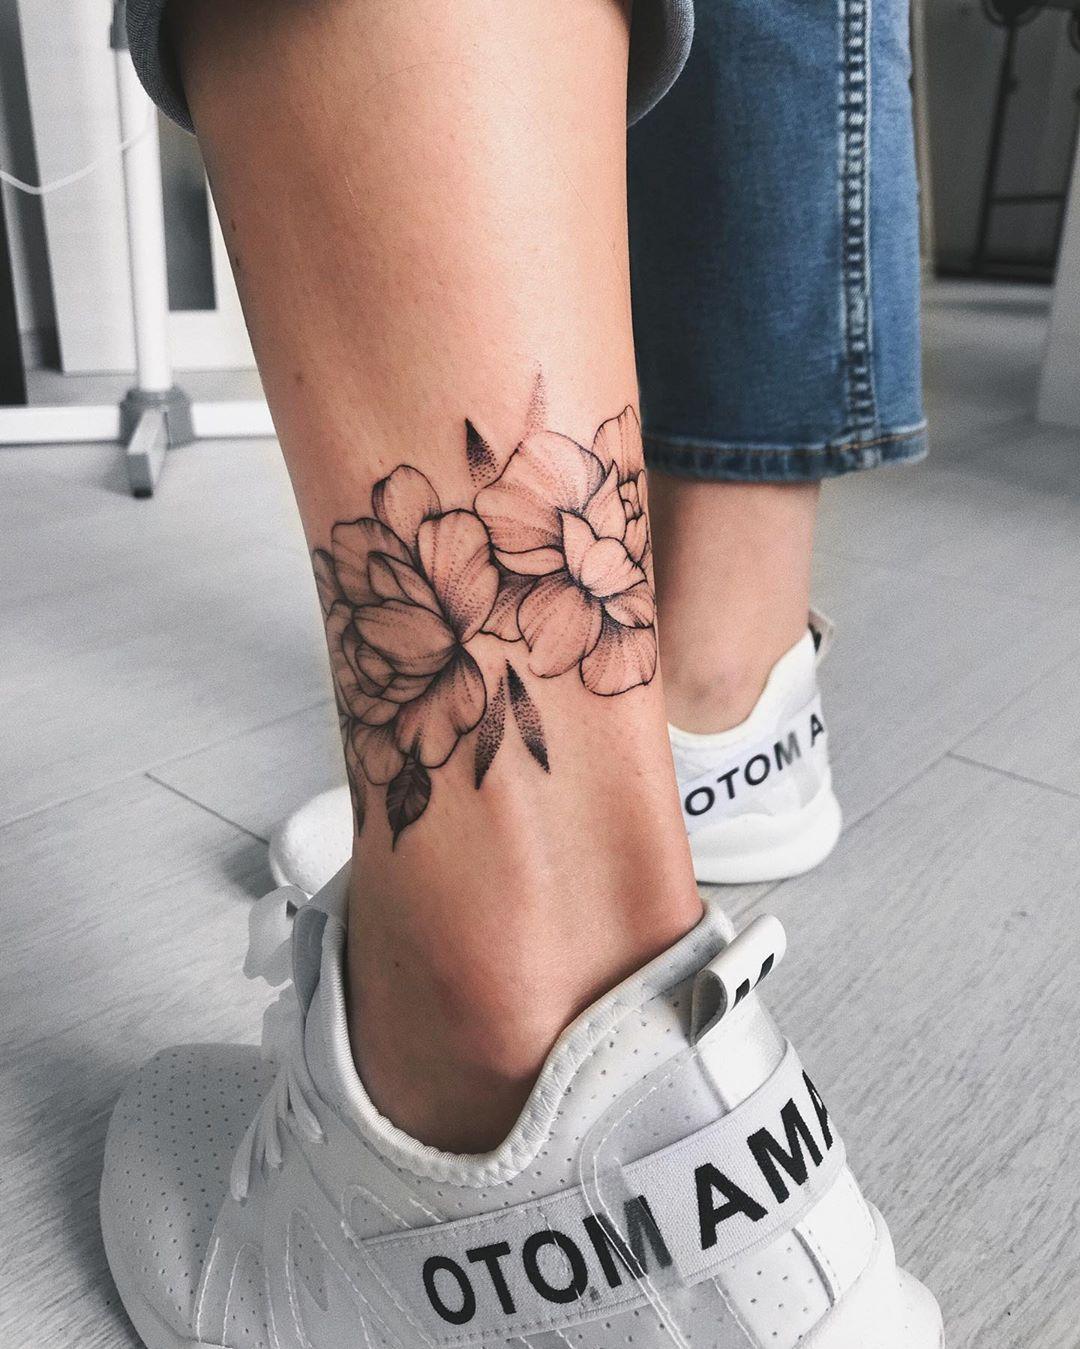 "Photo of D.Sh. on Instagram: ""Winner giveaway @n_haidym ✨ Believe in your luck and take part in contests;) #dashashvylytattoo #ttt #tatt #tattoorivne # tattoo …"""